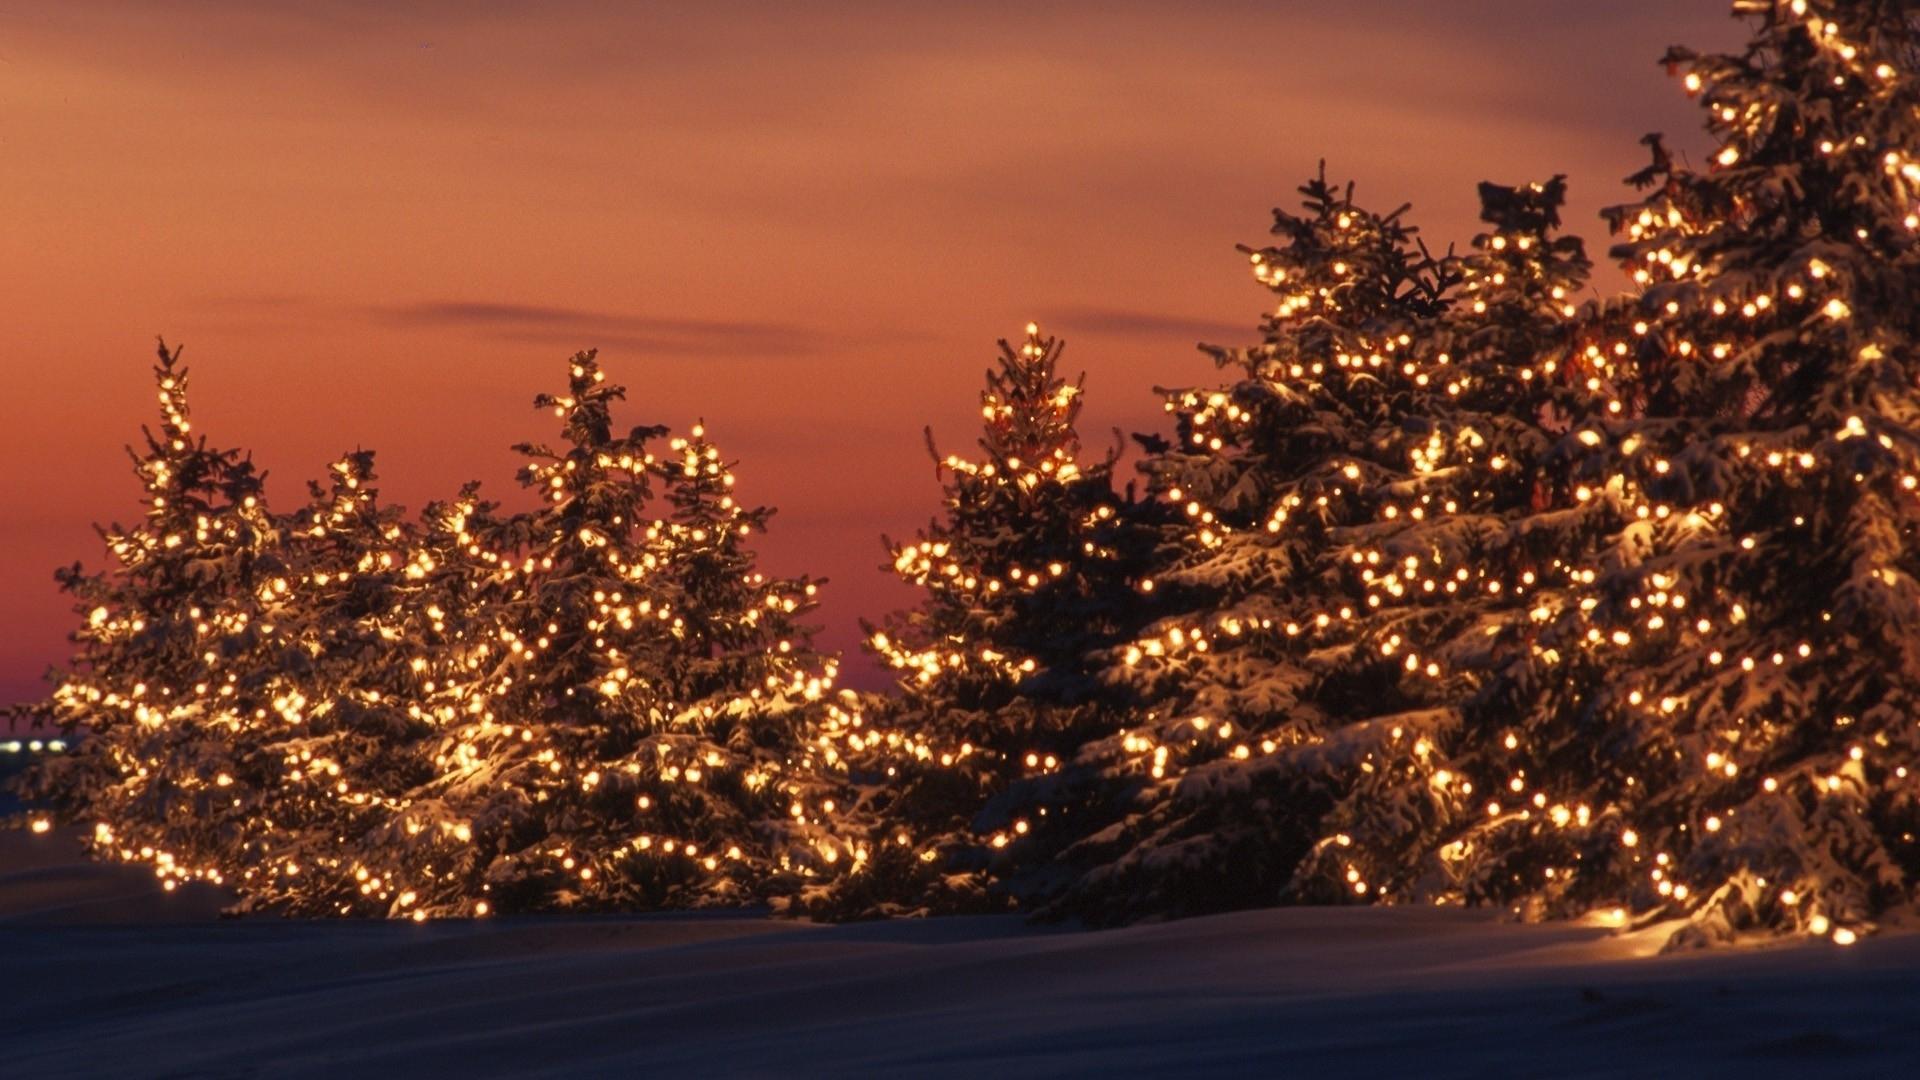 free desktop christmas lights wallpapers - wallpaper.wiki